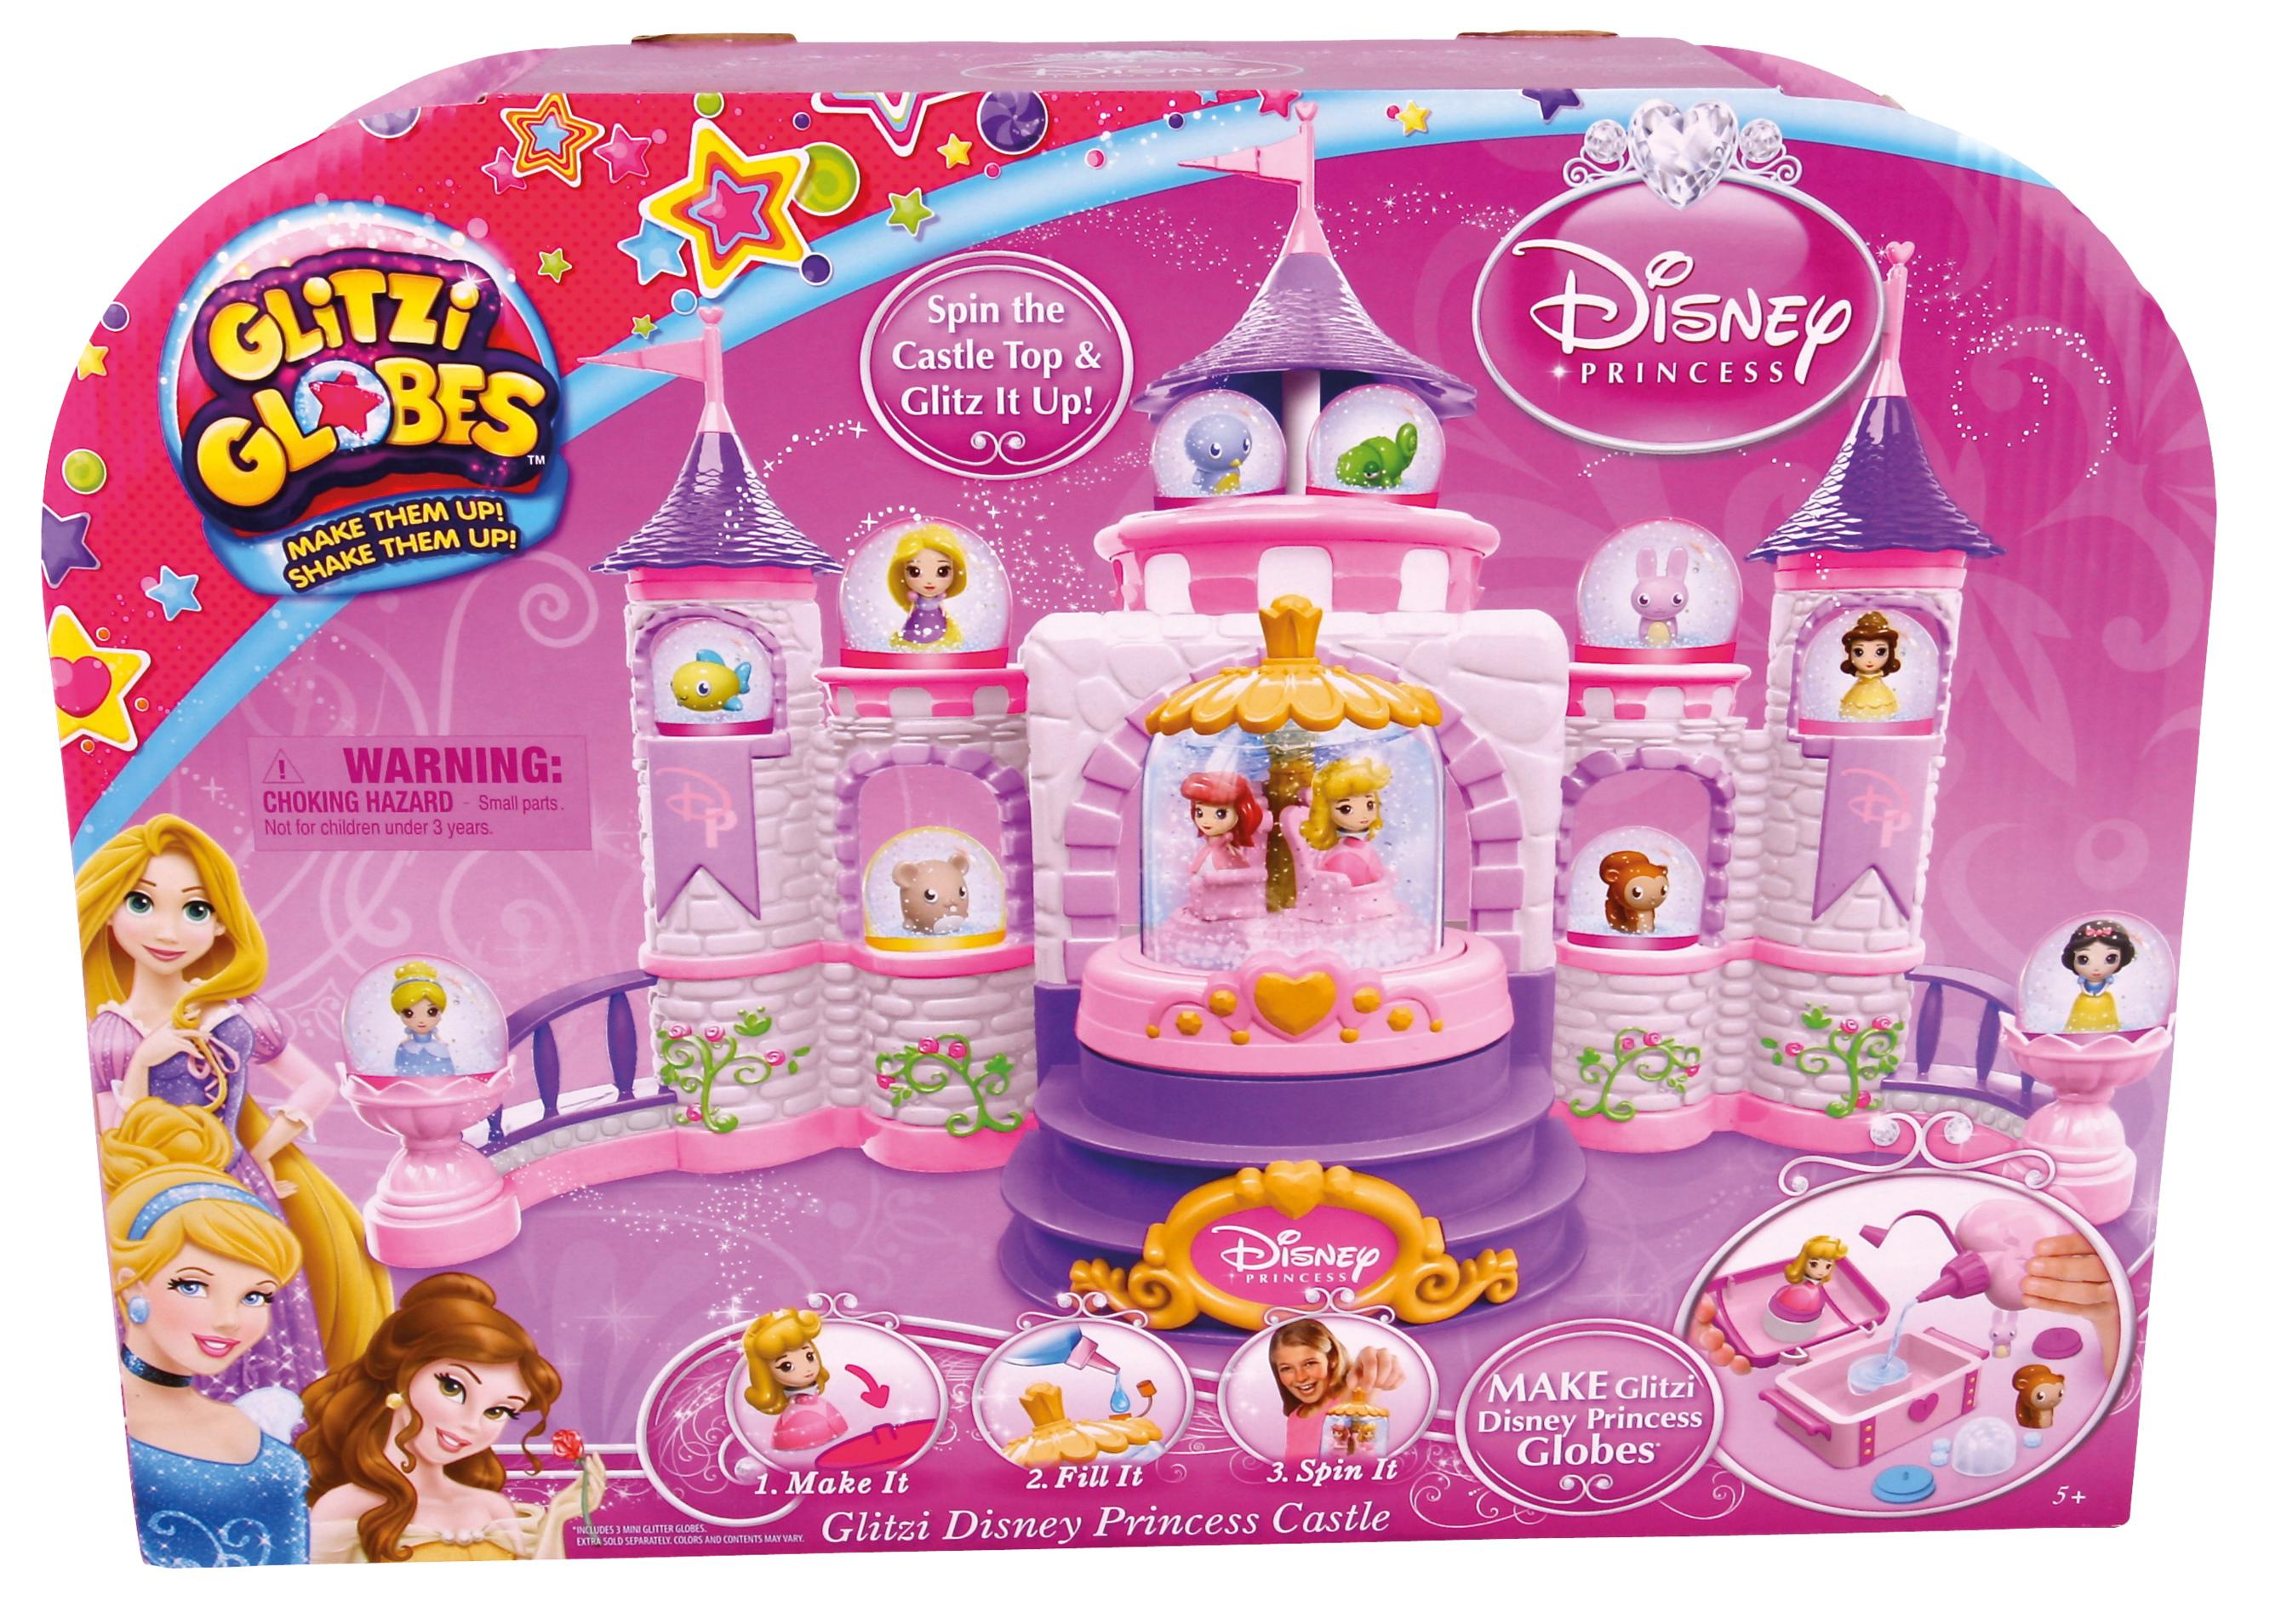 Amazon.com: Glitzi Globes Disney Princess Spin and Sparkle ...